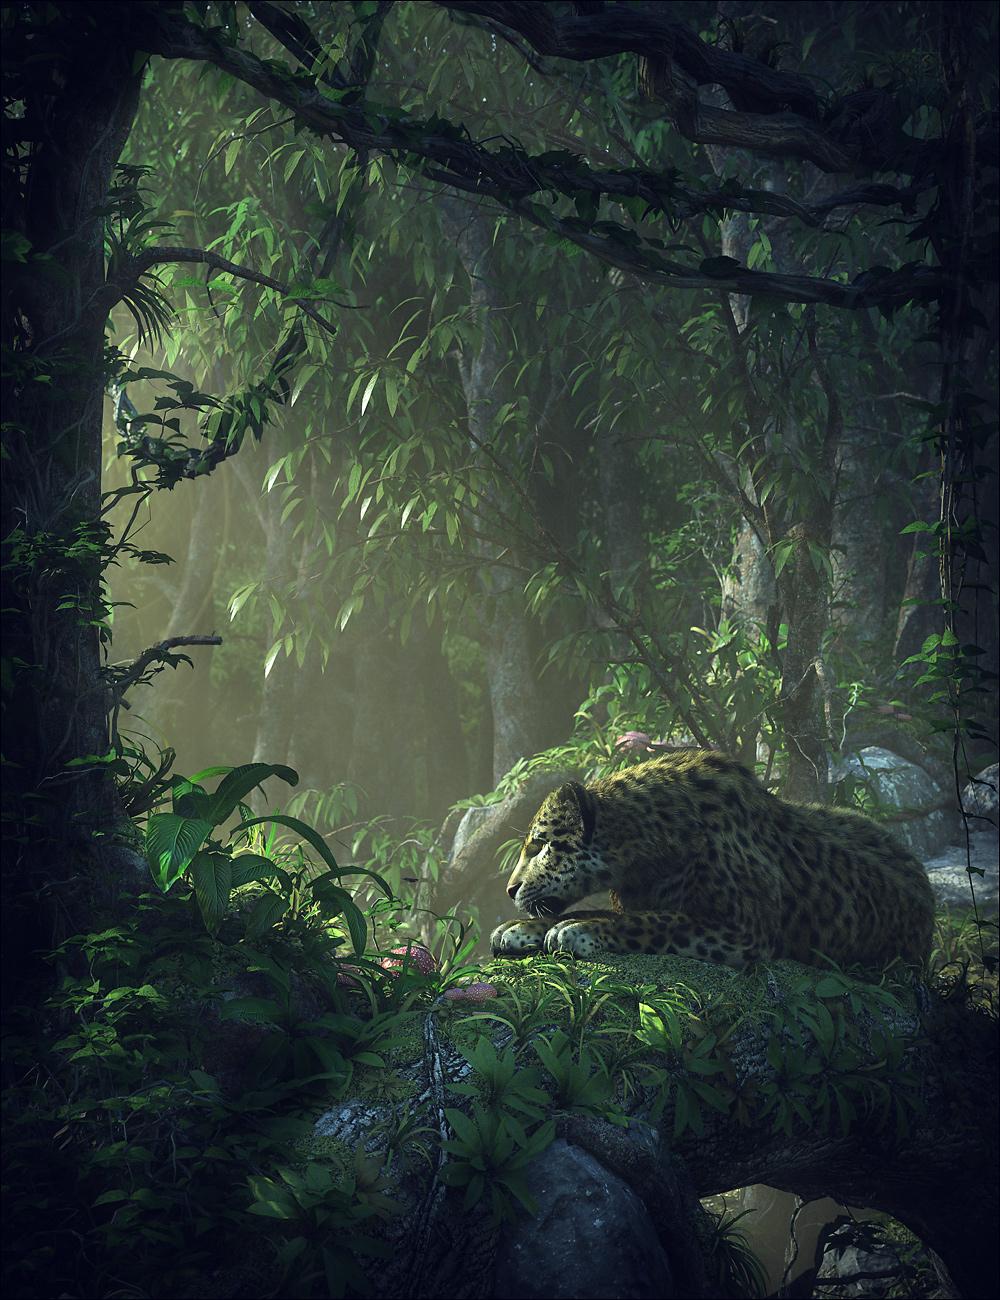 Stefan morrell jungle cat 1 24b6bb00 gwuo